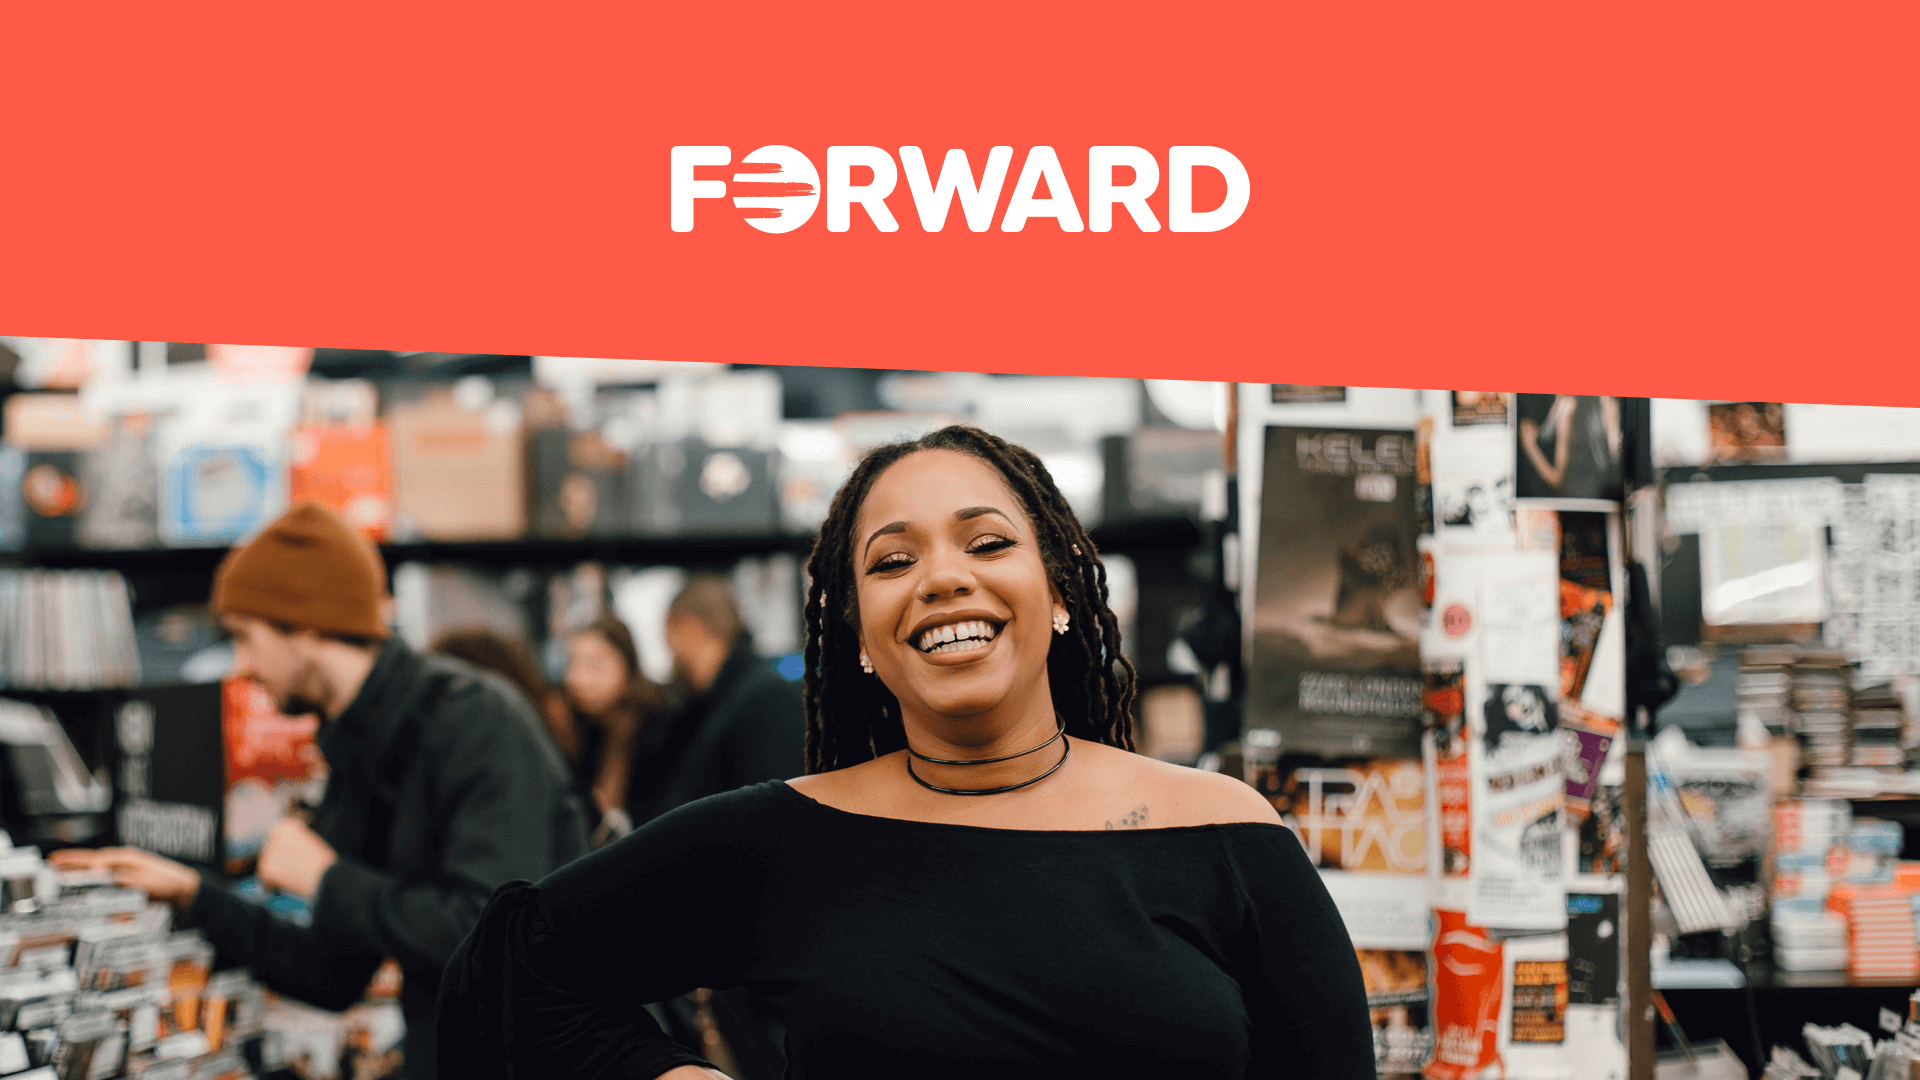 Woman smiling at the camera alongside new FORWARD logo